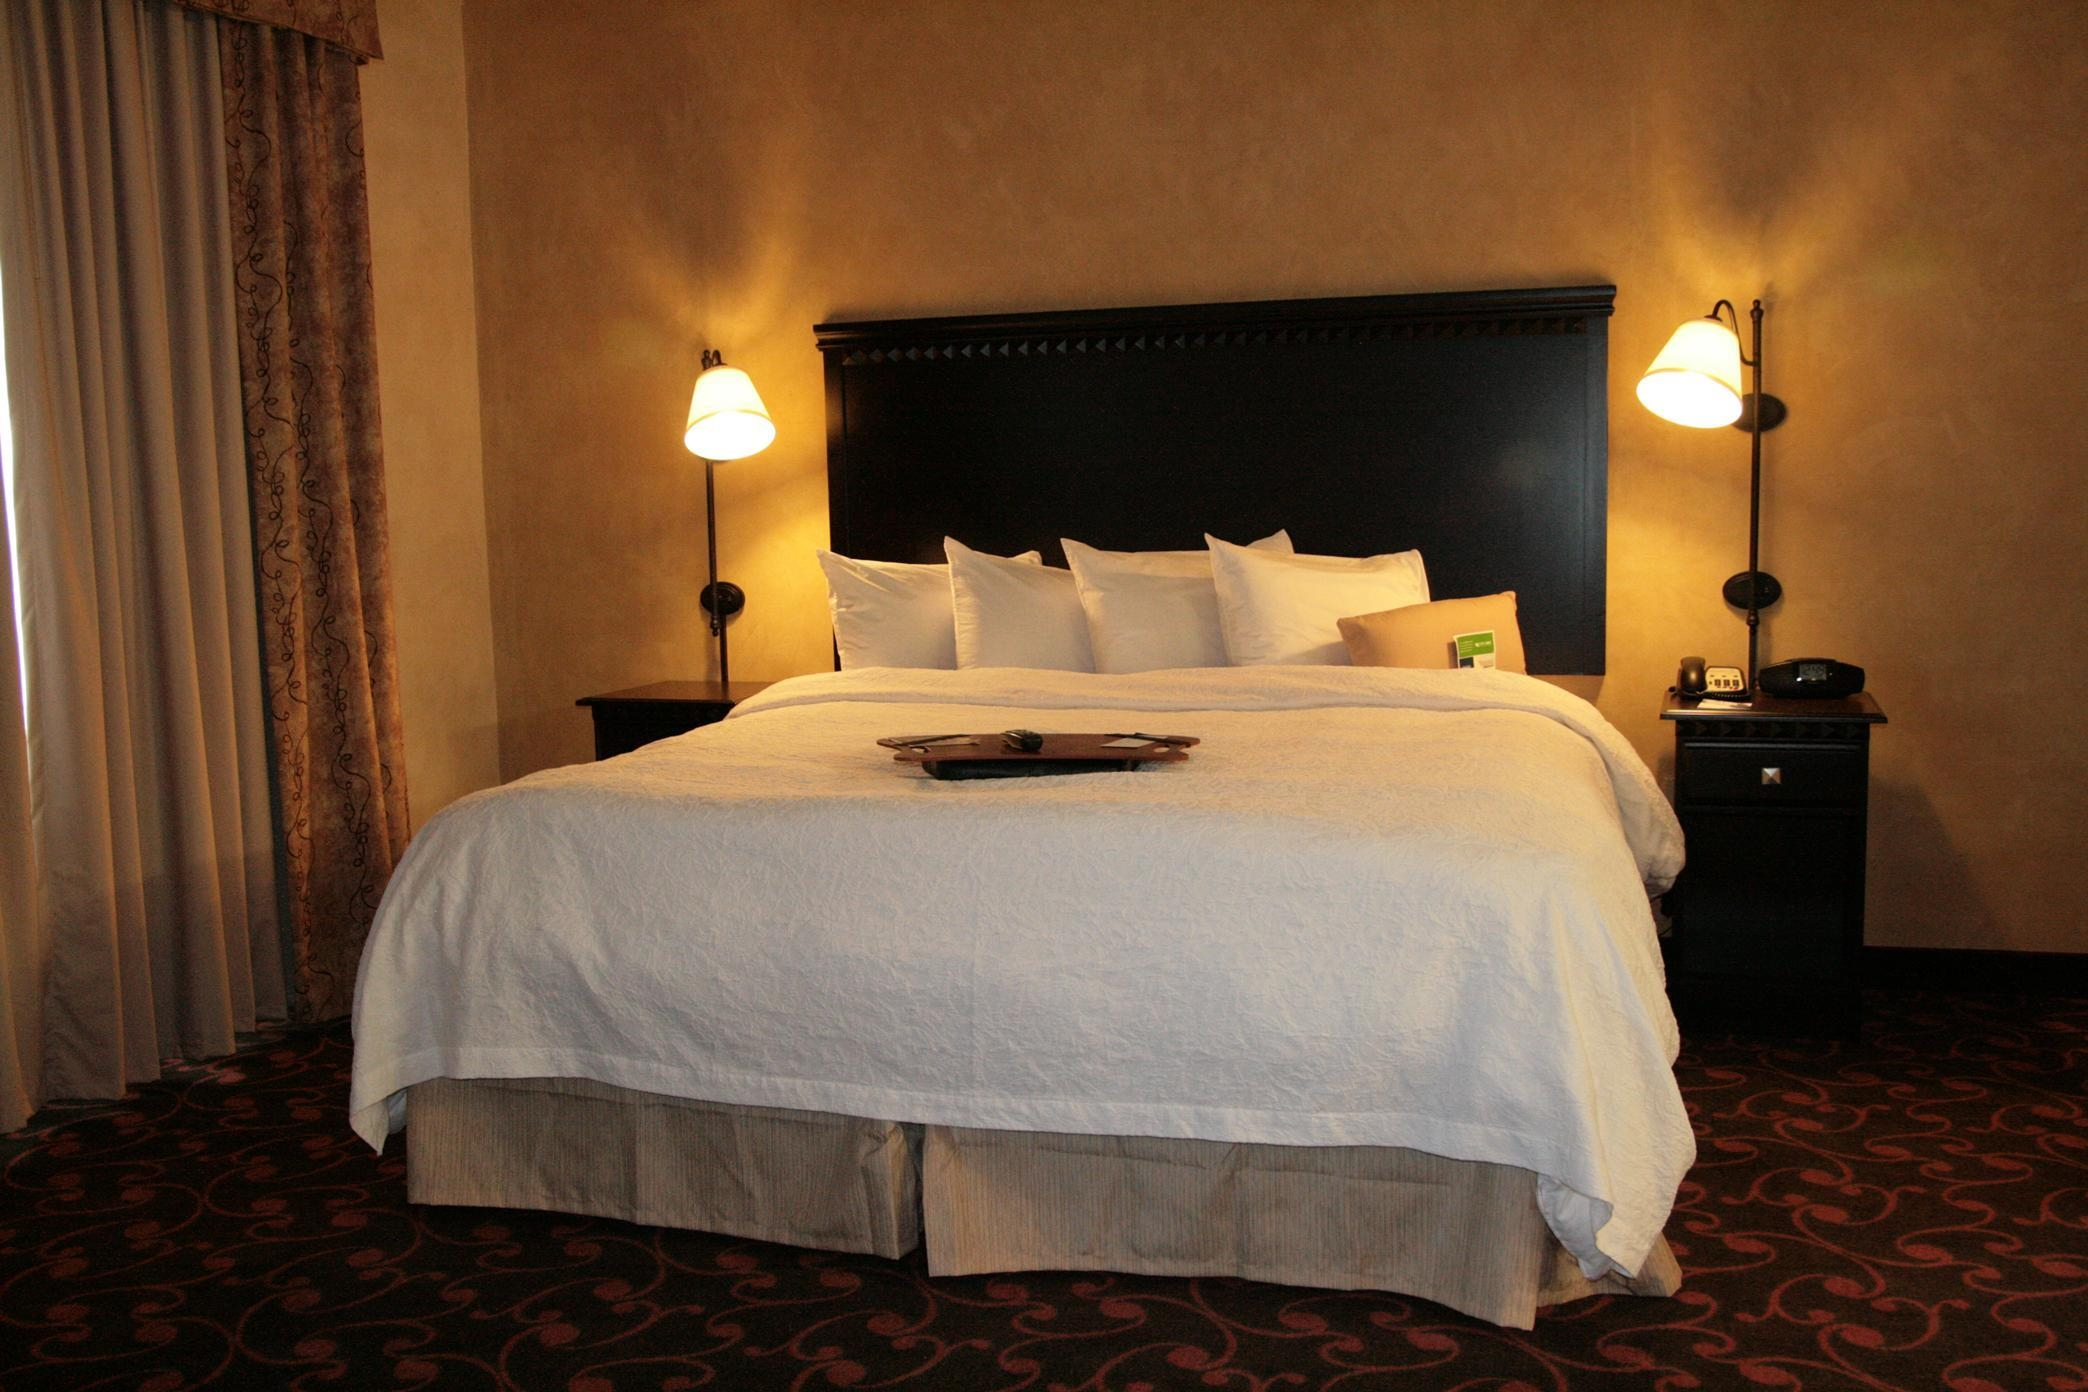 Hampton Inn & Suites Dallas-Arlington North-Entertainment District image 0